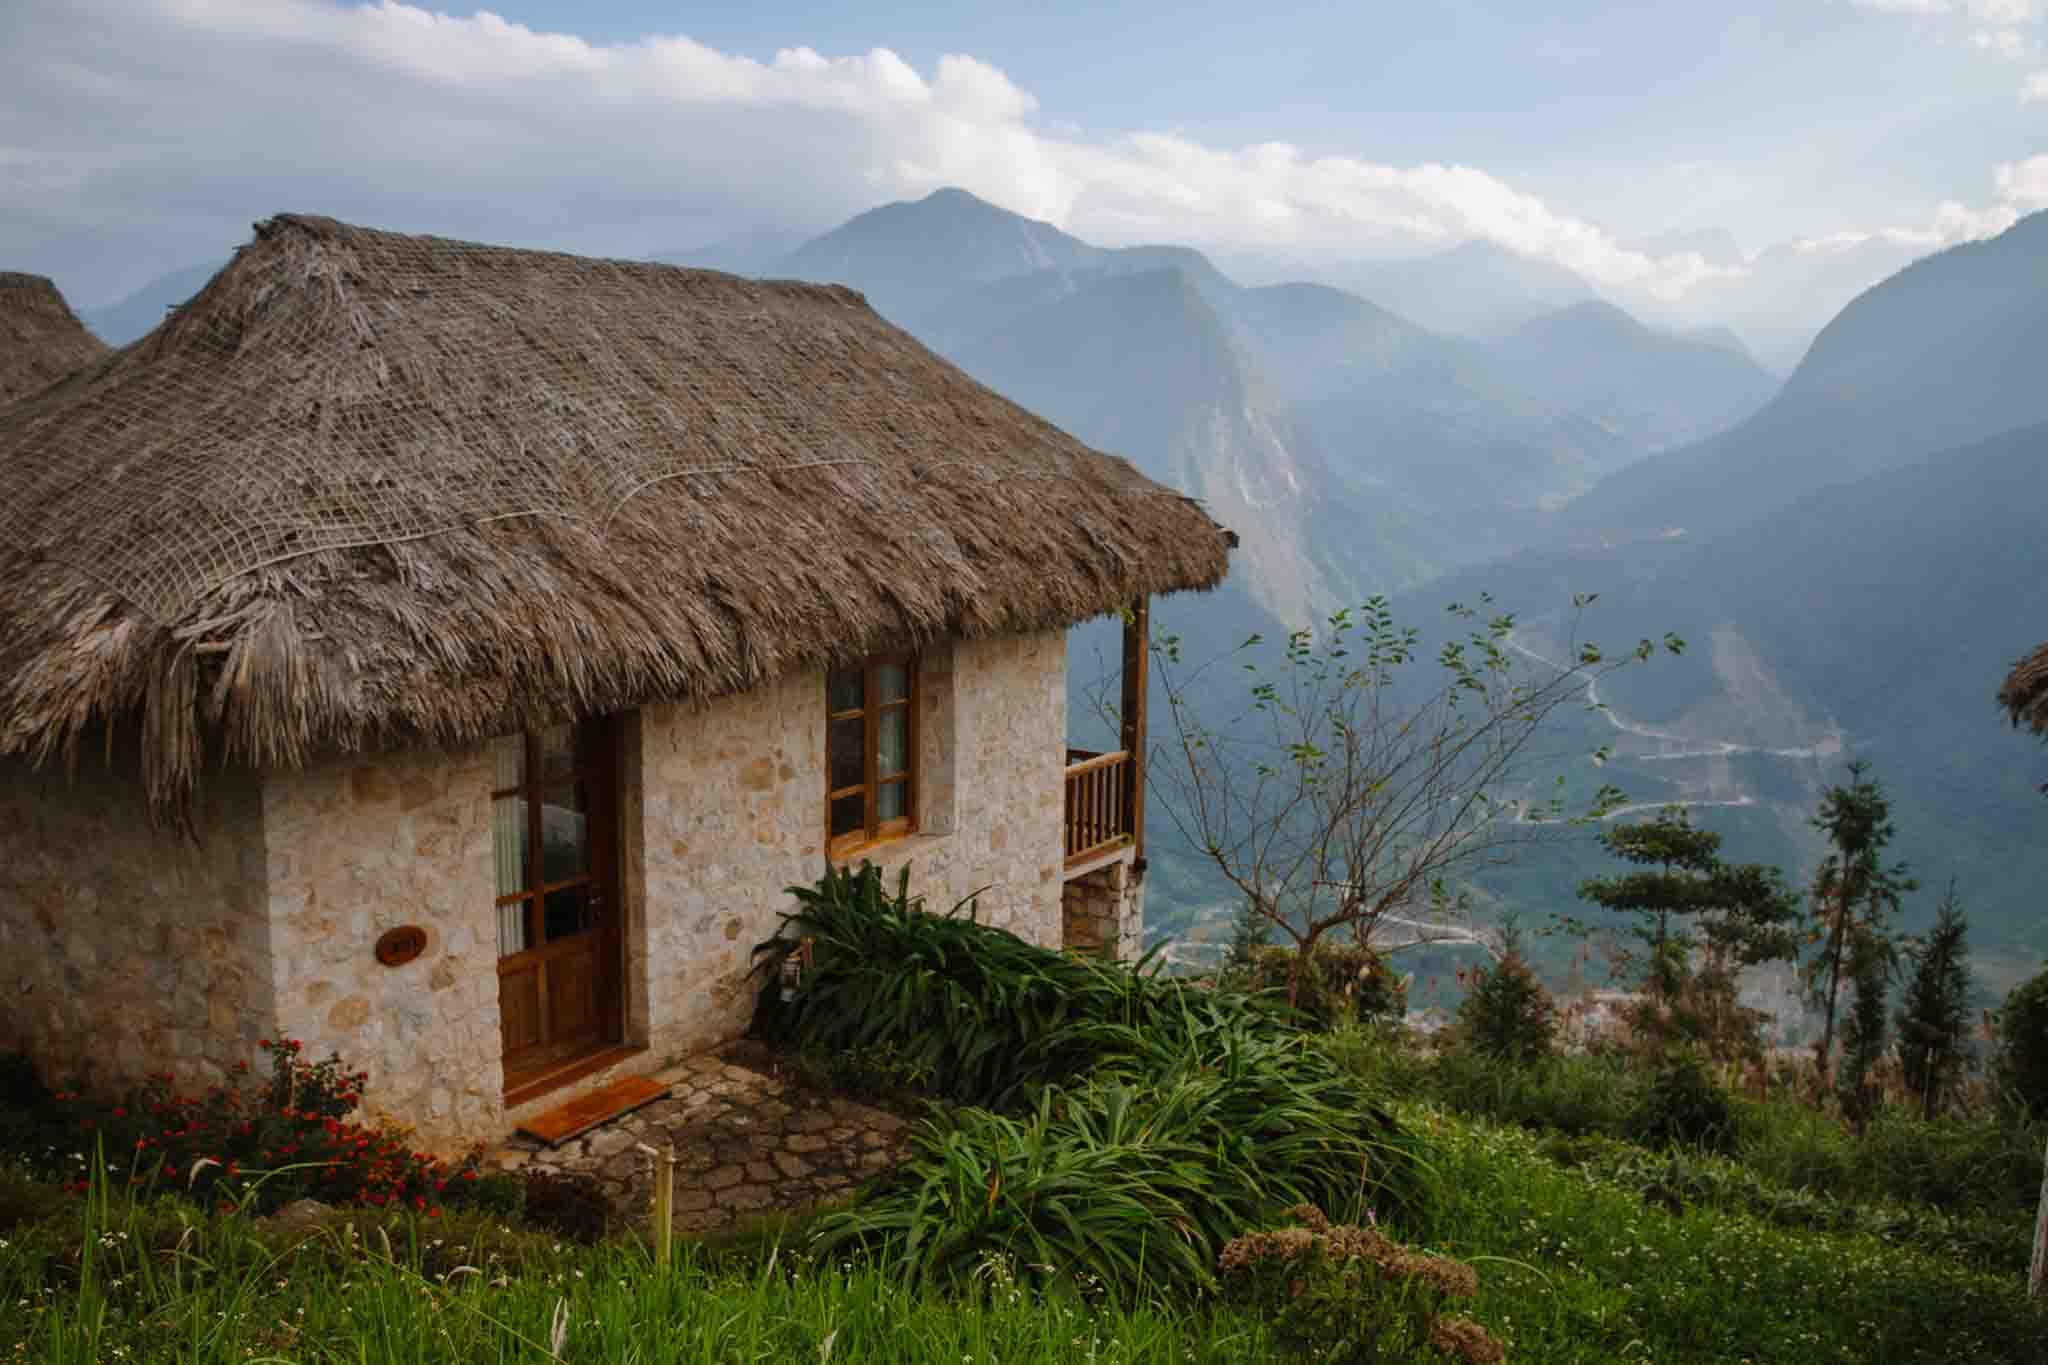 du lịch bền vững Topas Ecolodge 1